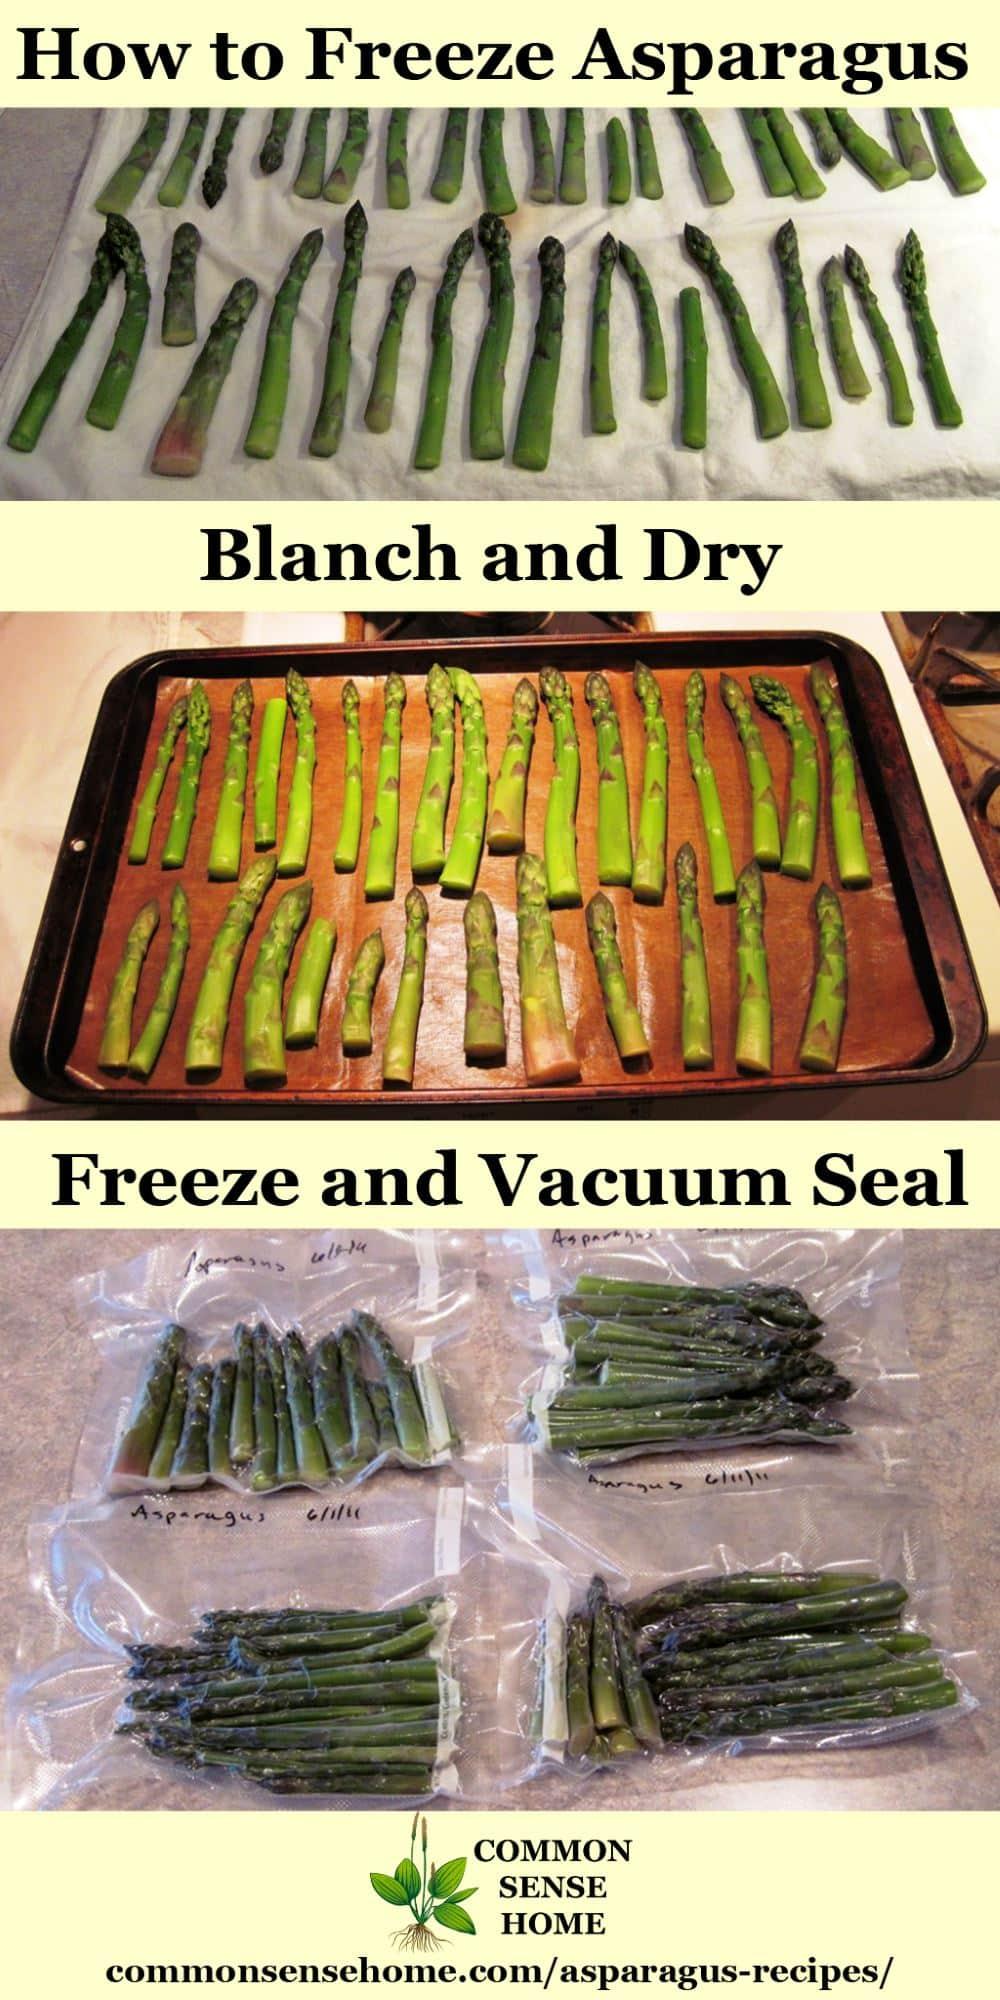 25 Healthy Asparagus Recipes Plus 4 Ways To Store Asparagus